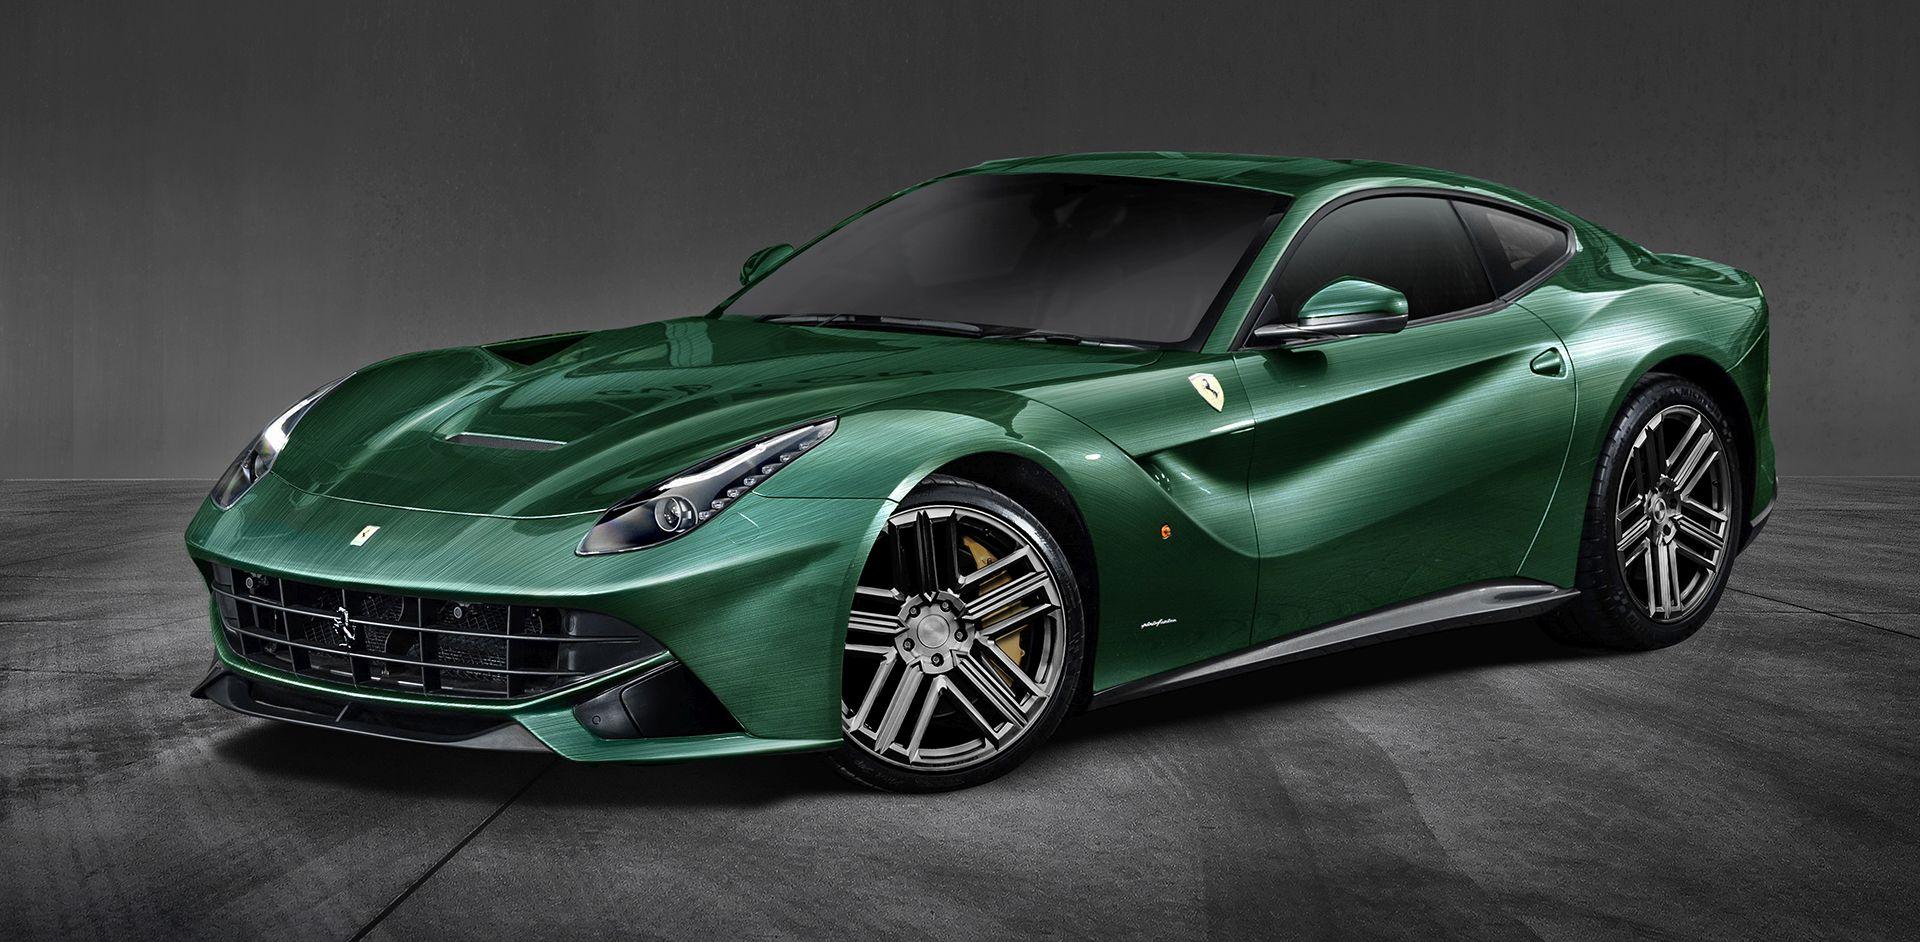 Ferrari F12 Berlinetta Racing Green Edition Limited Edition Carlex Design